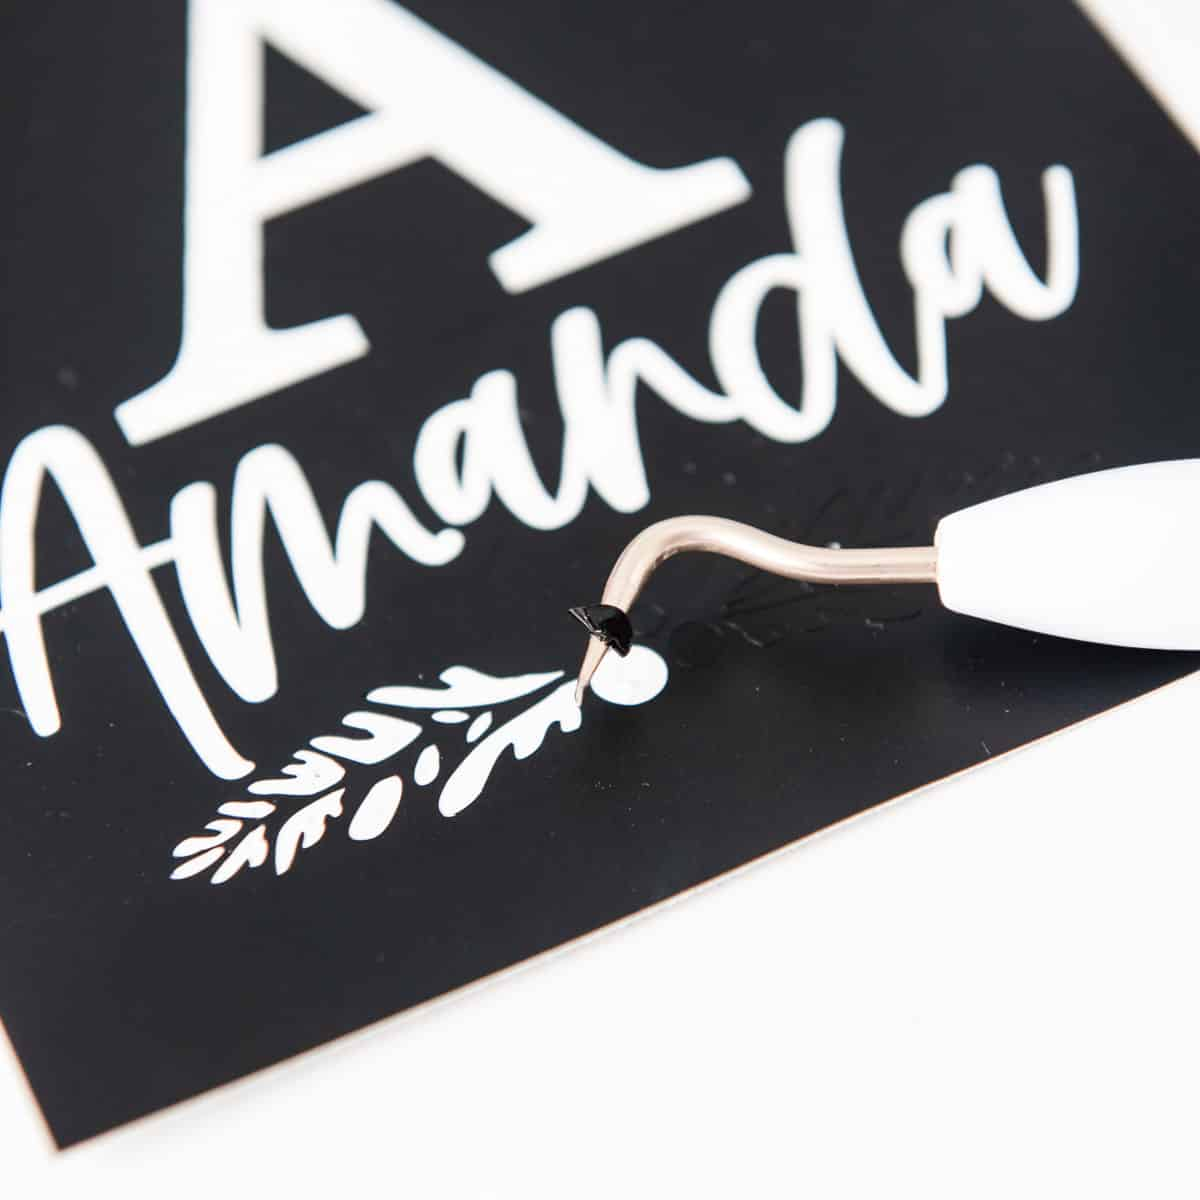 weeding vinyl stencil for stocking hanger